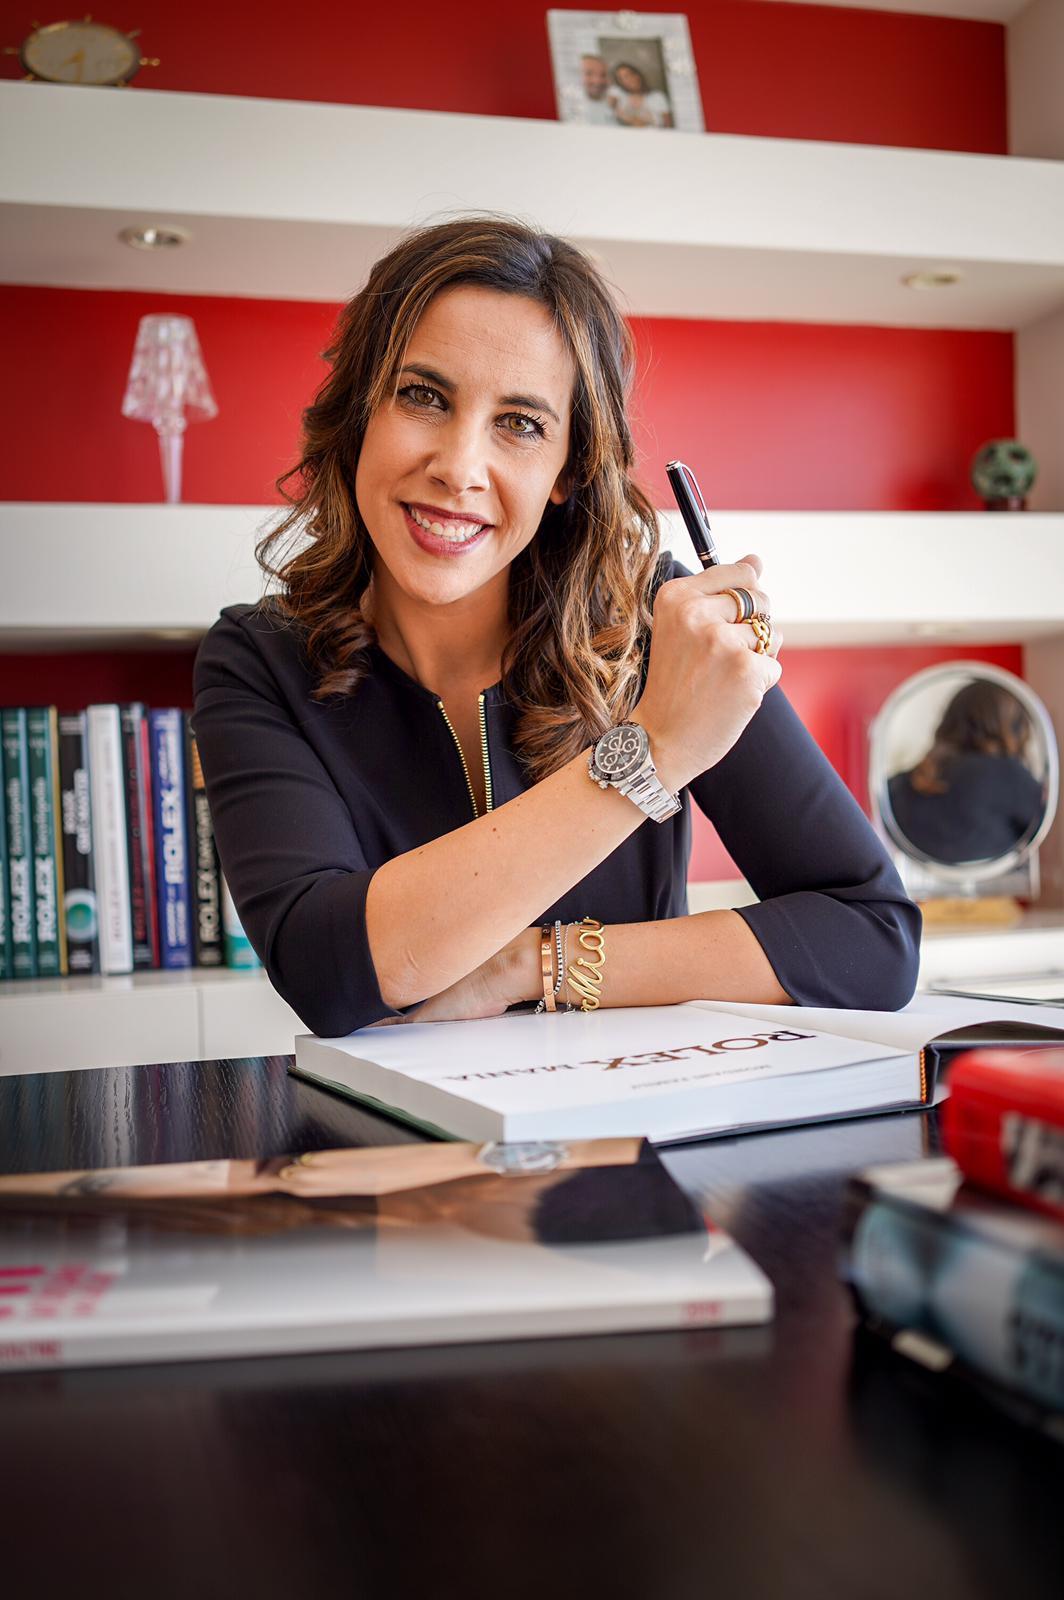 Giorgia Mondani's book signing at Baselworld 2019! - MondaniWeb